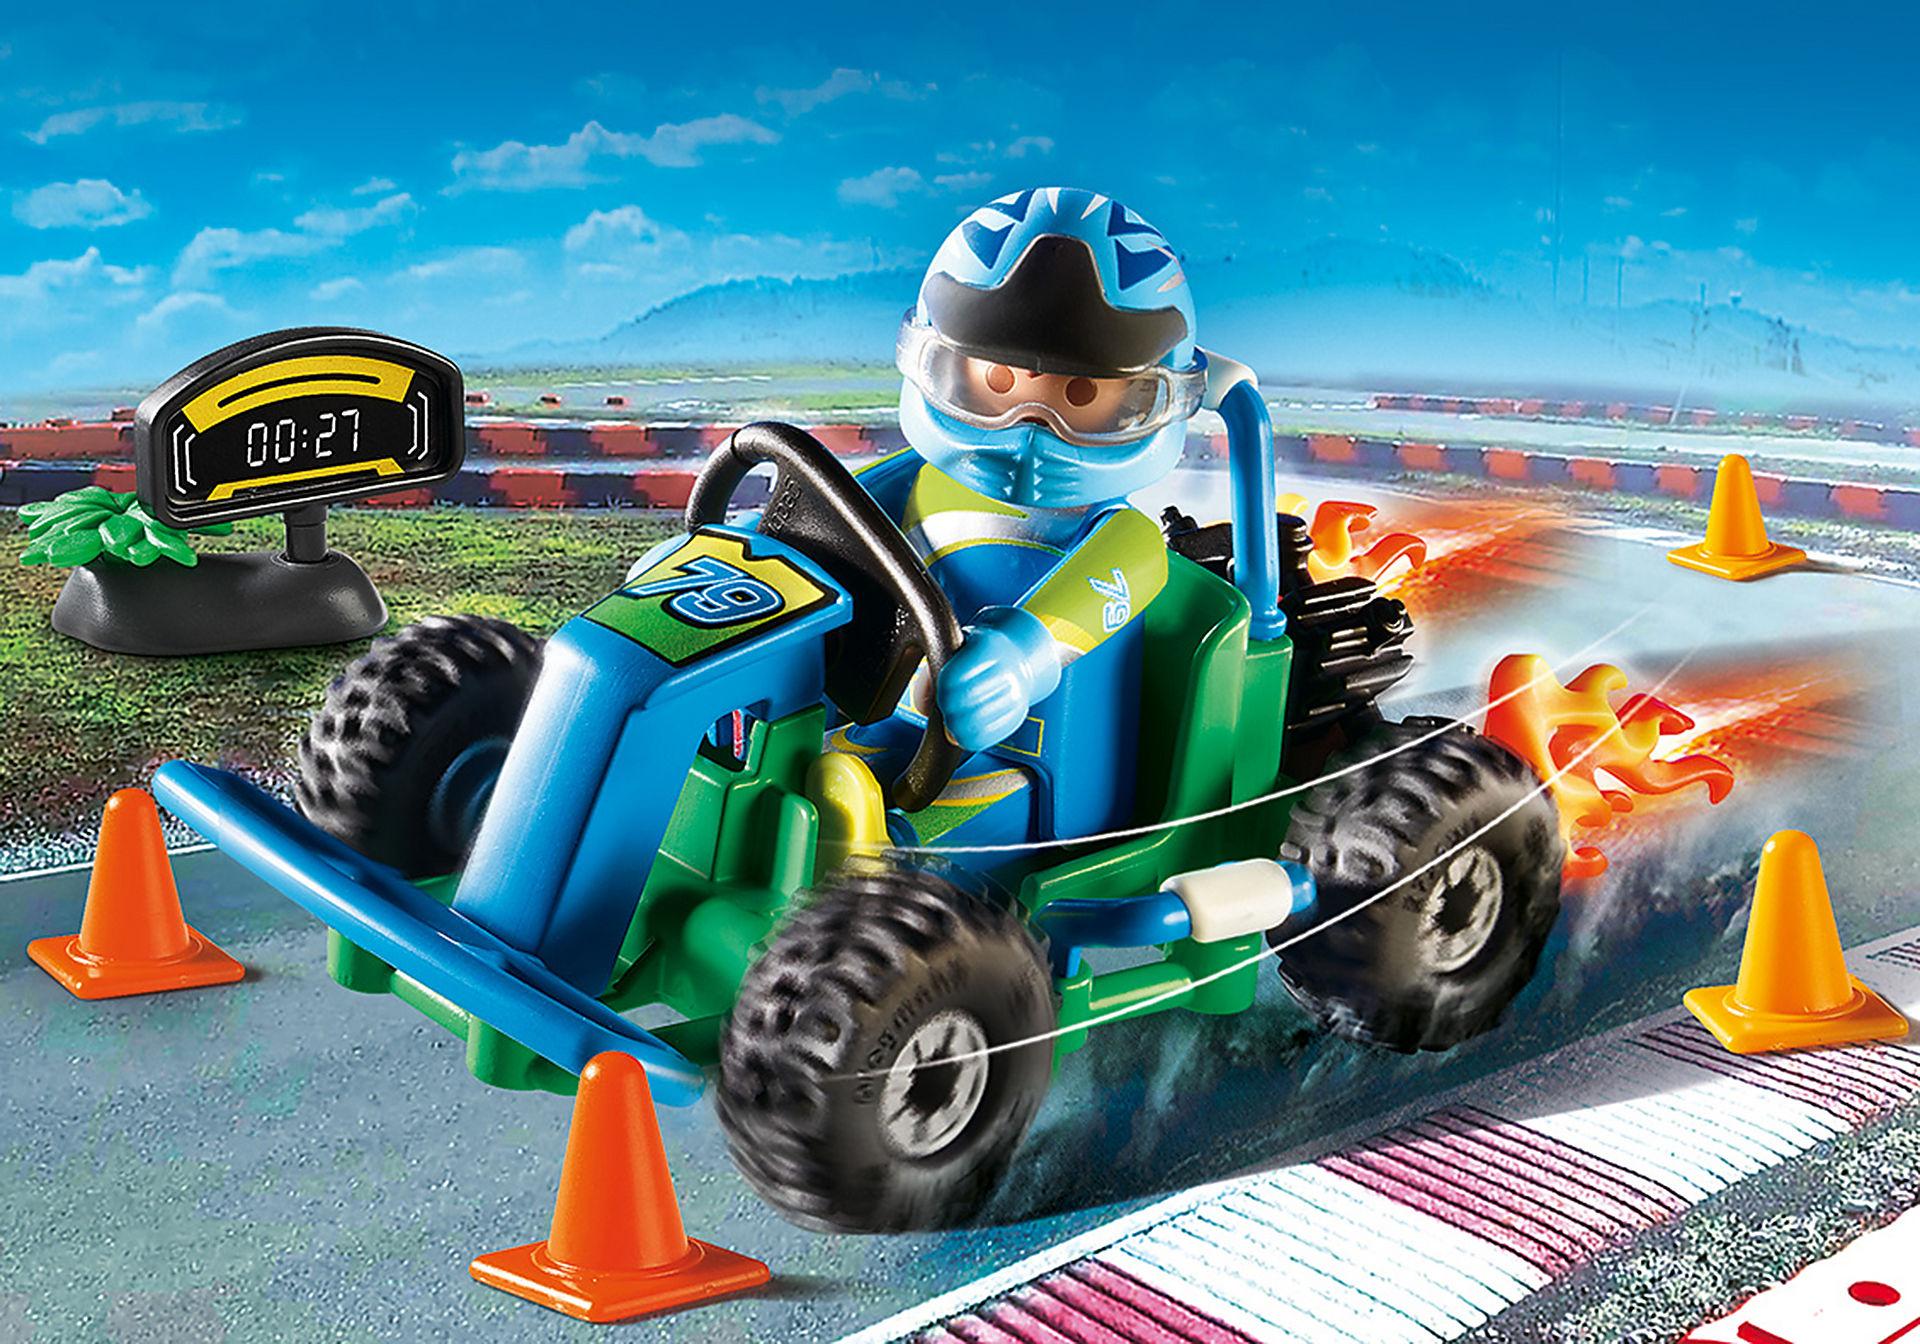 70292 Go-Kart Racer Gift Set zoom image1